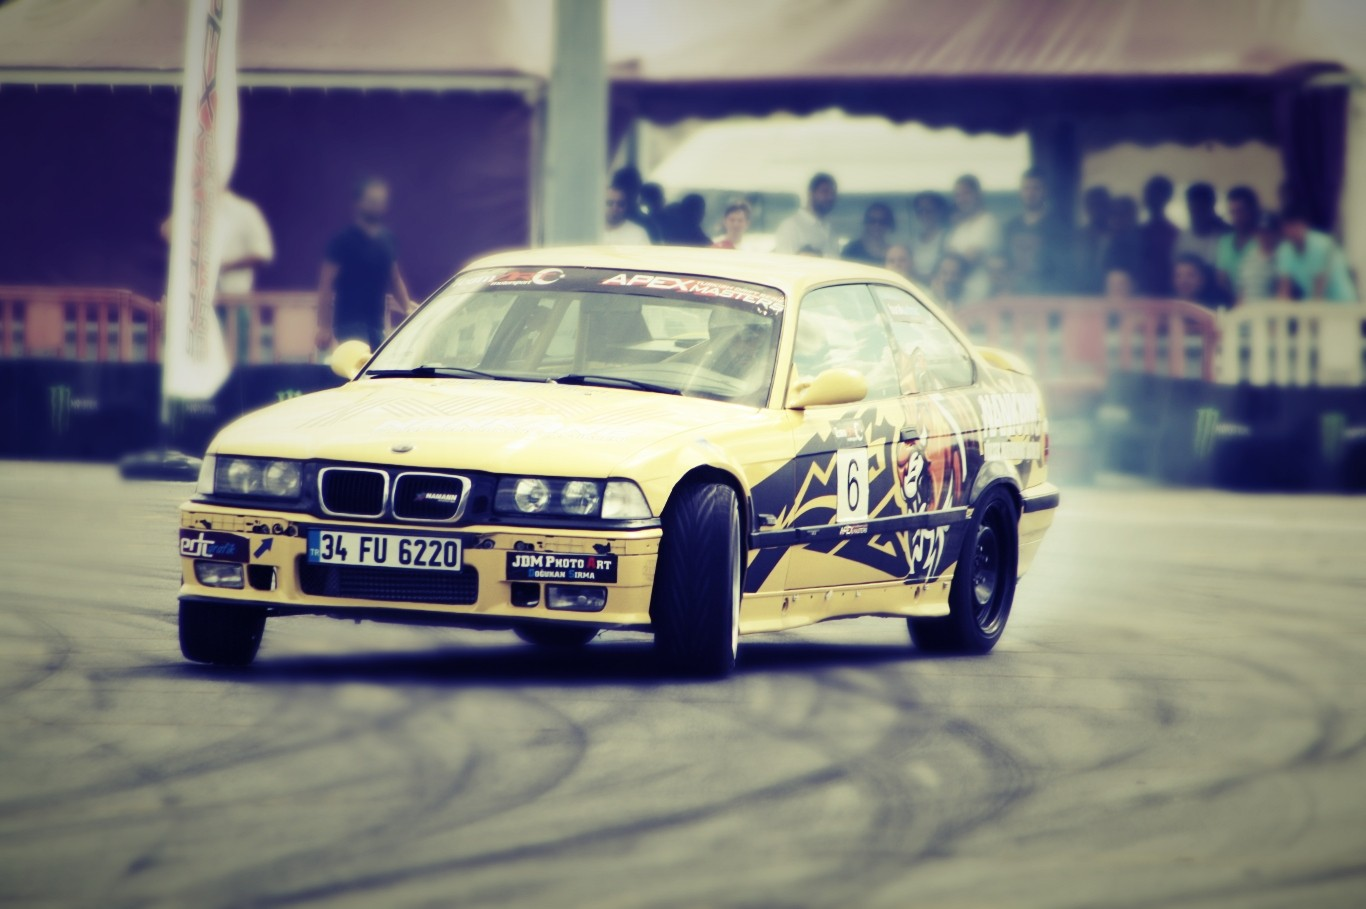 hight resolution of 1366x909 px bmw bmw e36 car drift old car racing